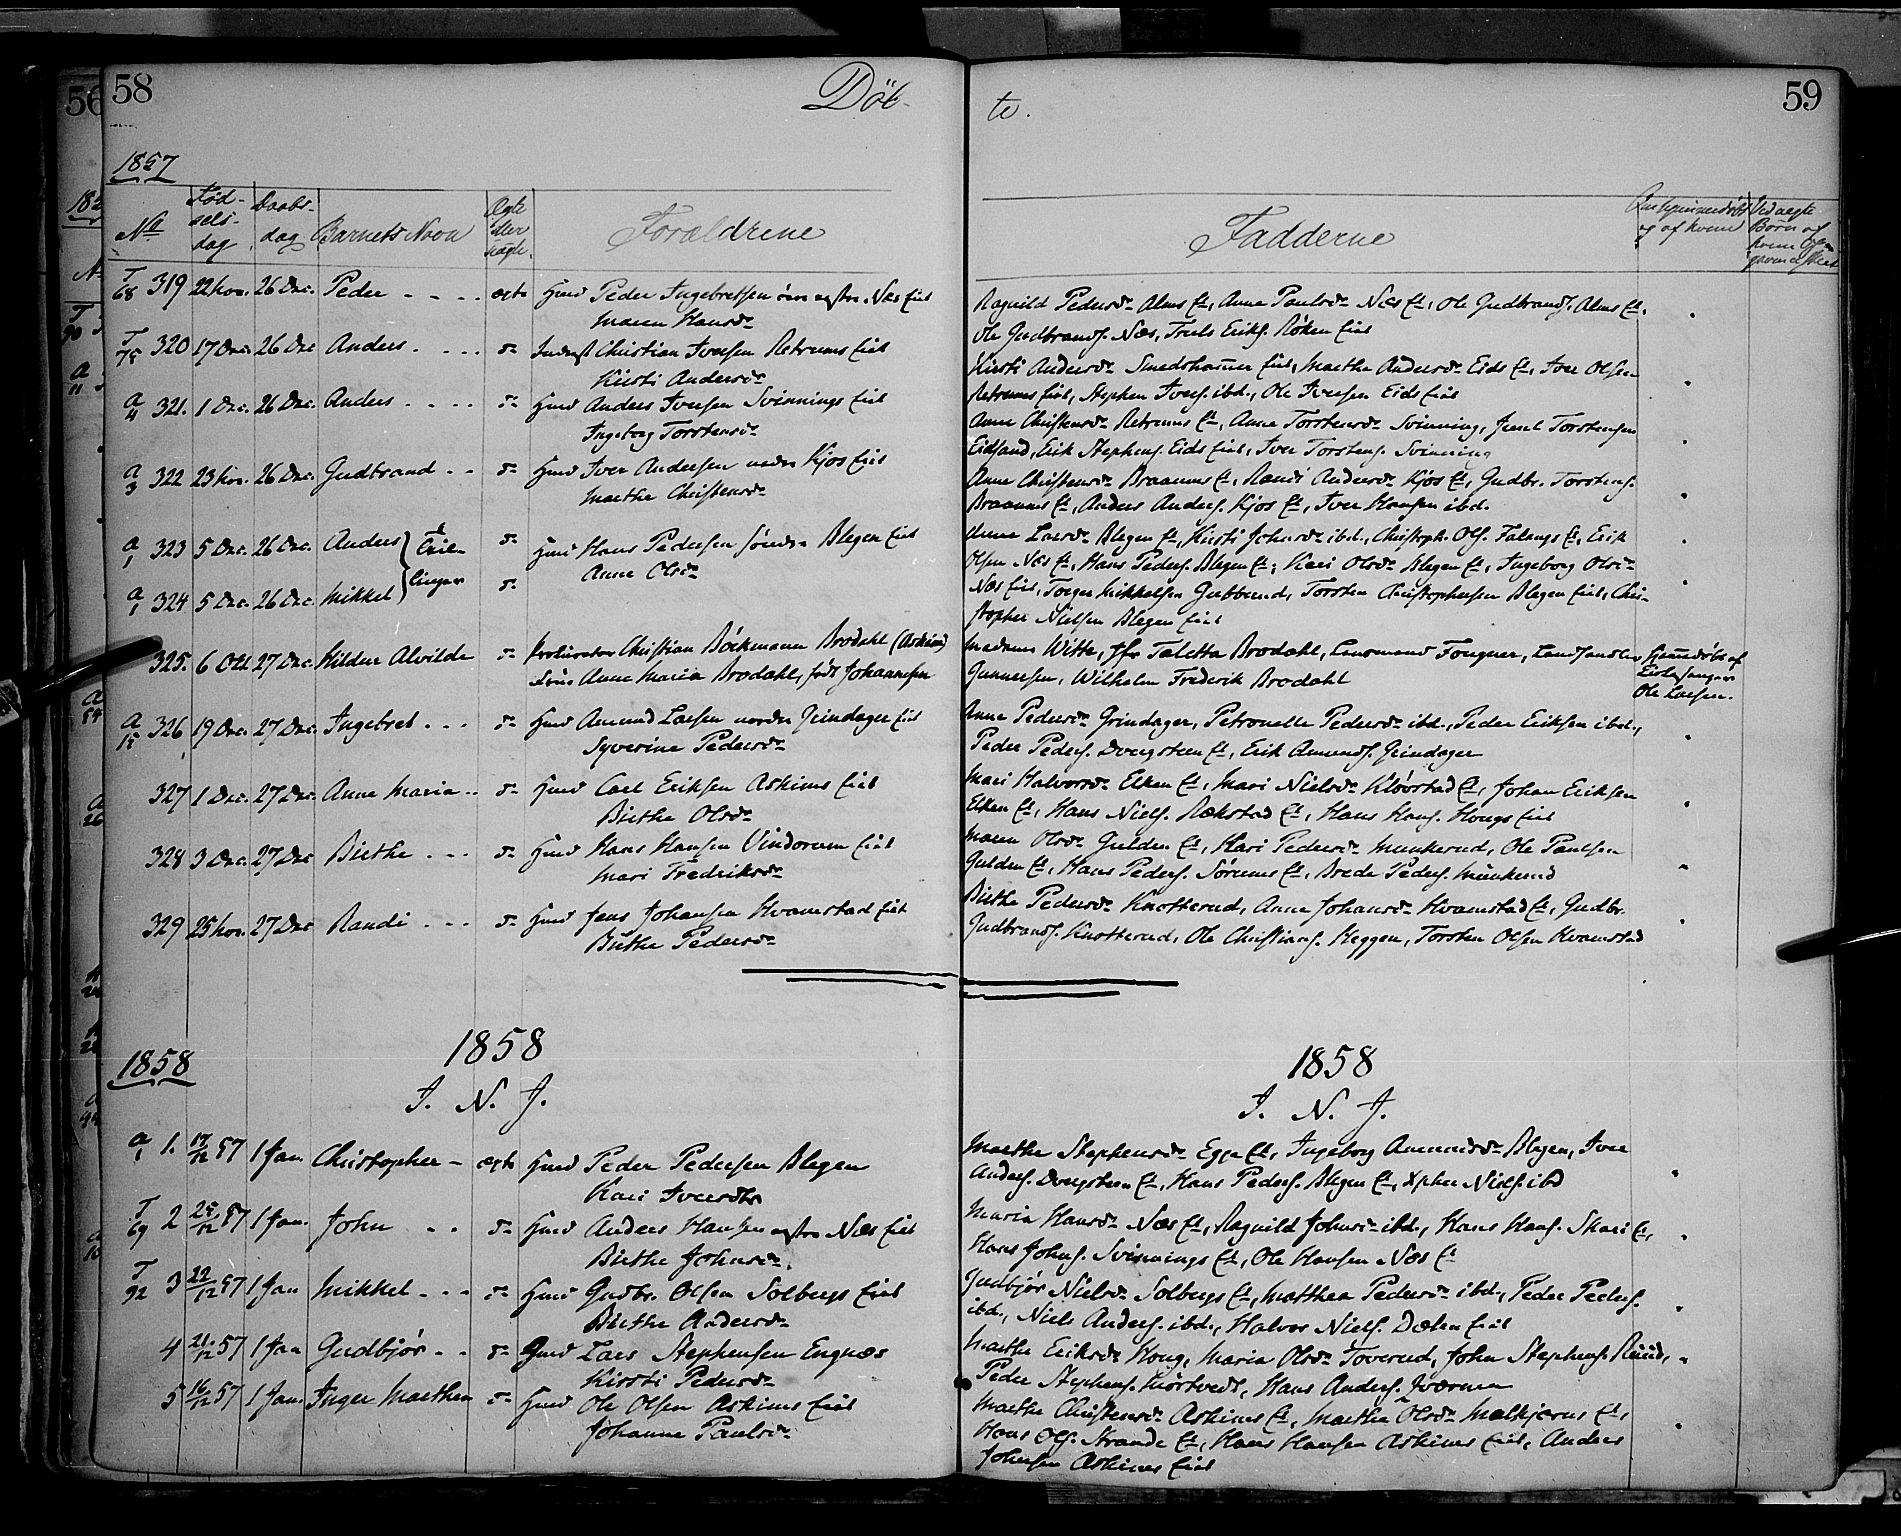 SAH, Gran prestekontor, Ministerialbok nr. 12, 1856-1874, s. 58-59